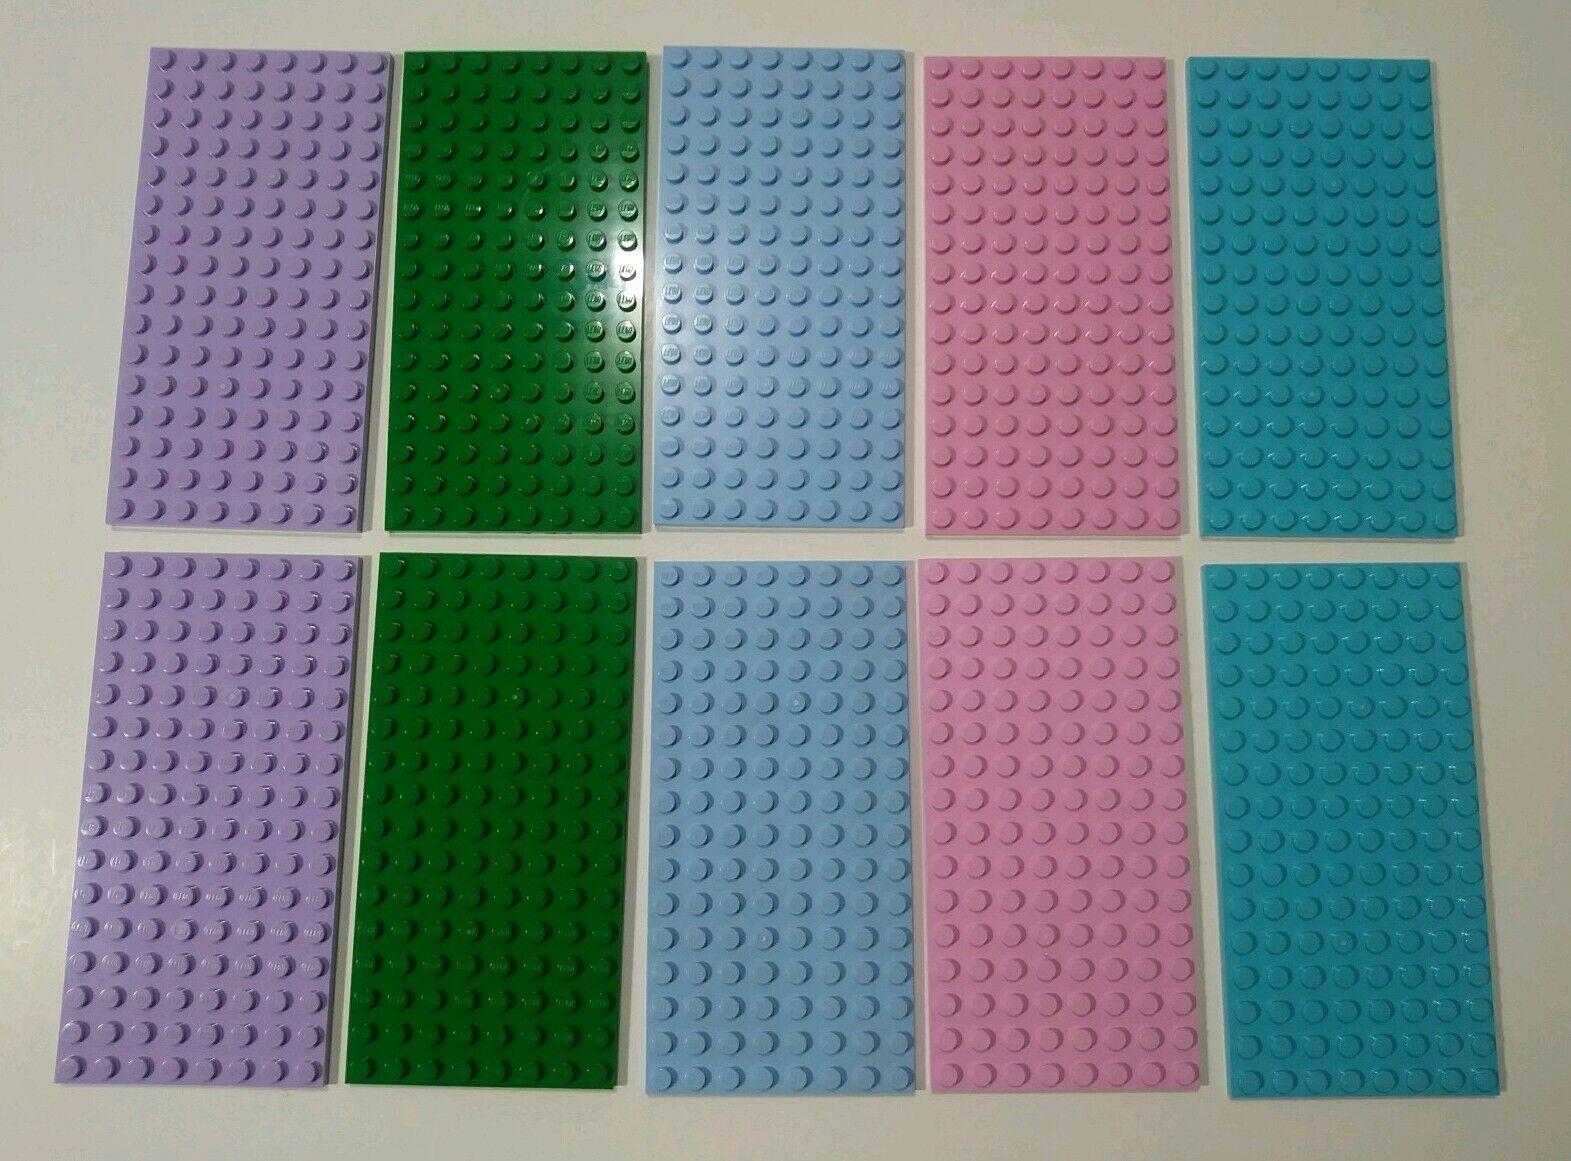 Lego Genuine Lego Base Plate 8 X 16 Choice Of Color 92438 Baseplate